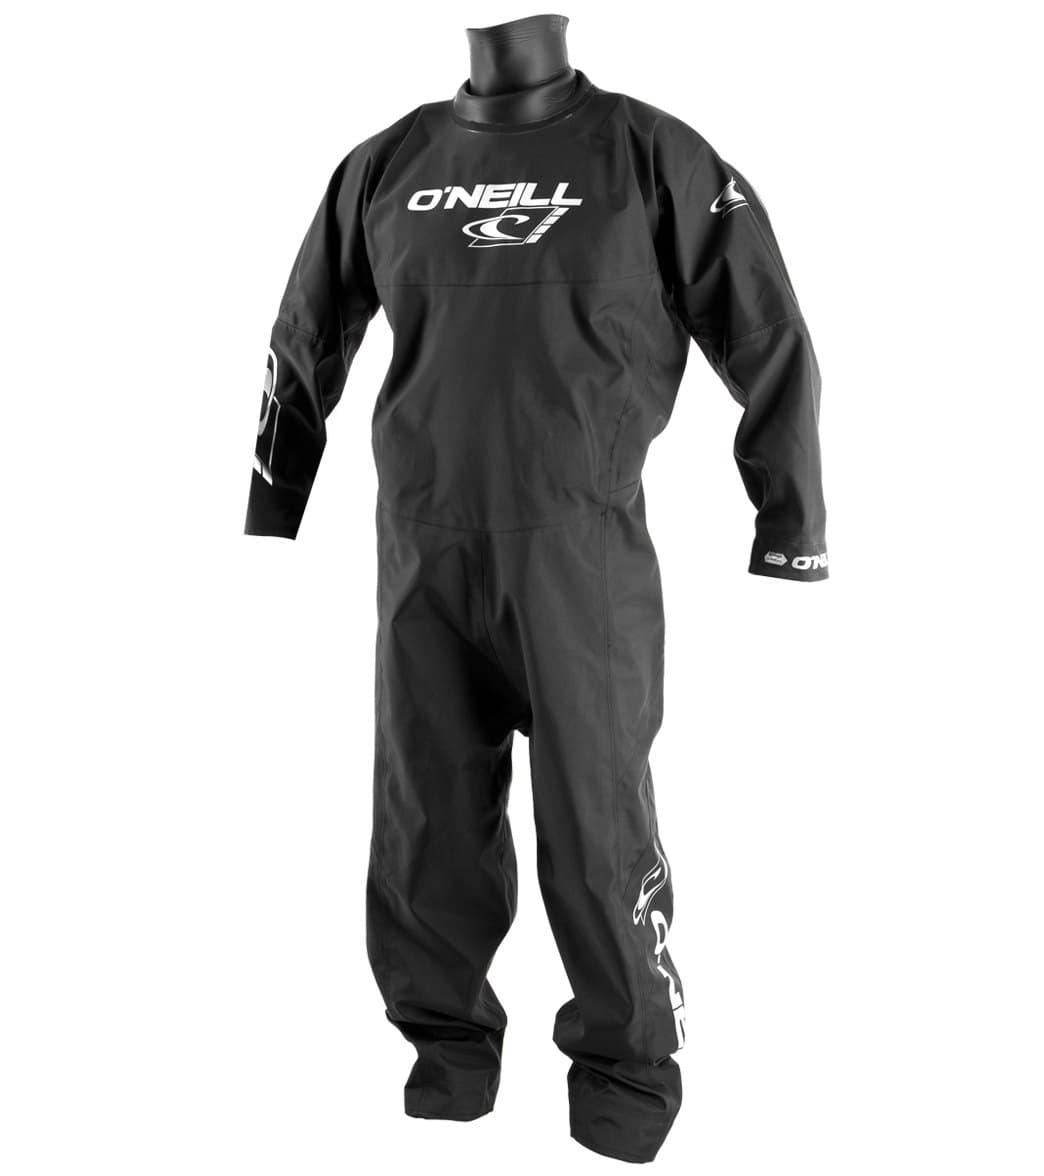 O'Neill Boost 300g Drysuit